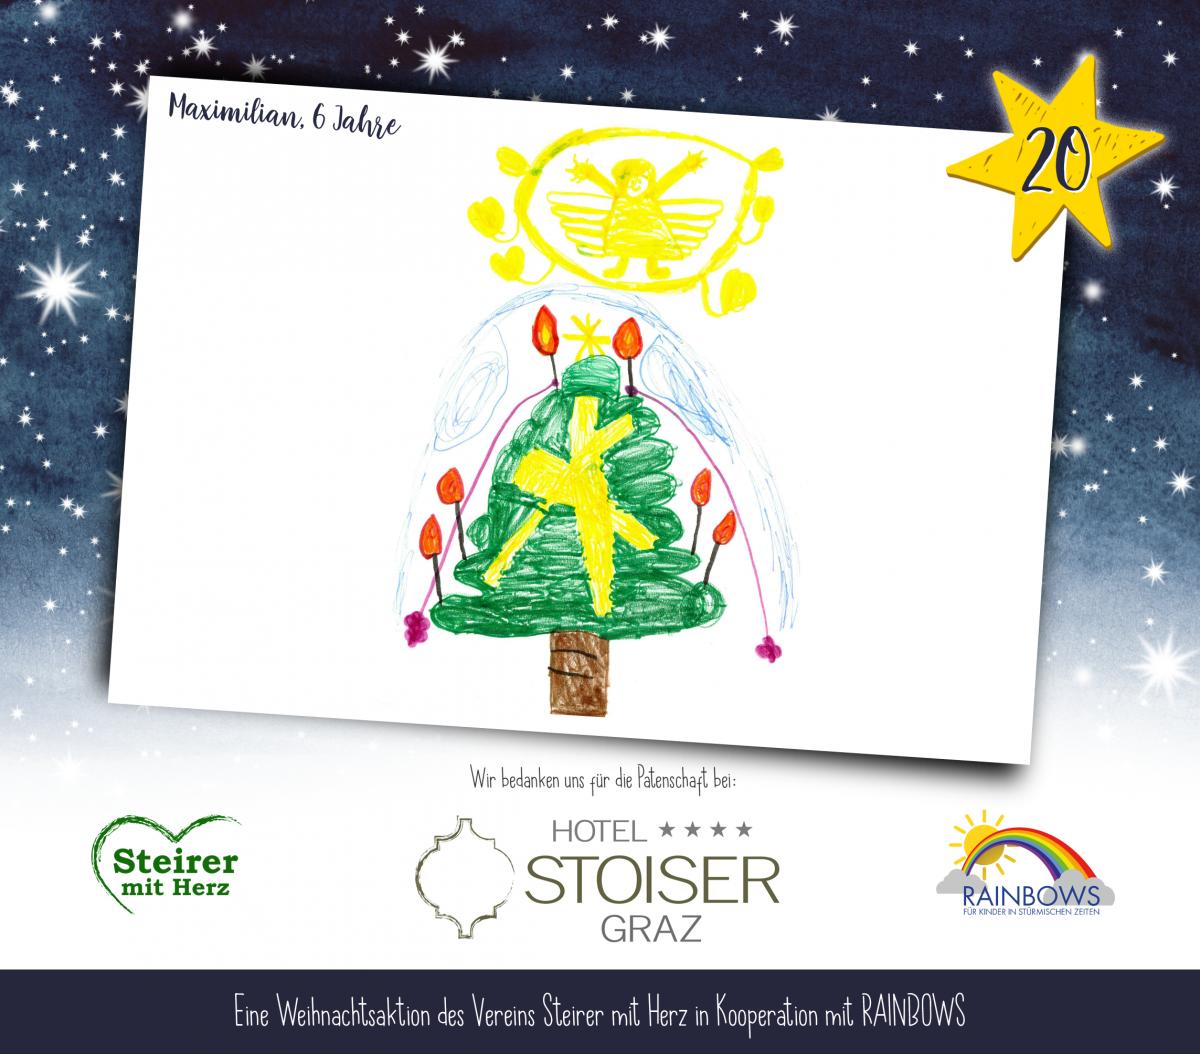 adventkalender_2018_steirermitherz_20